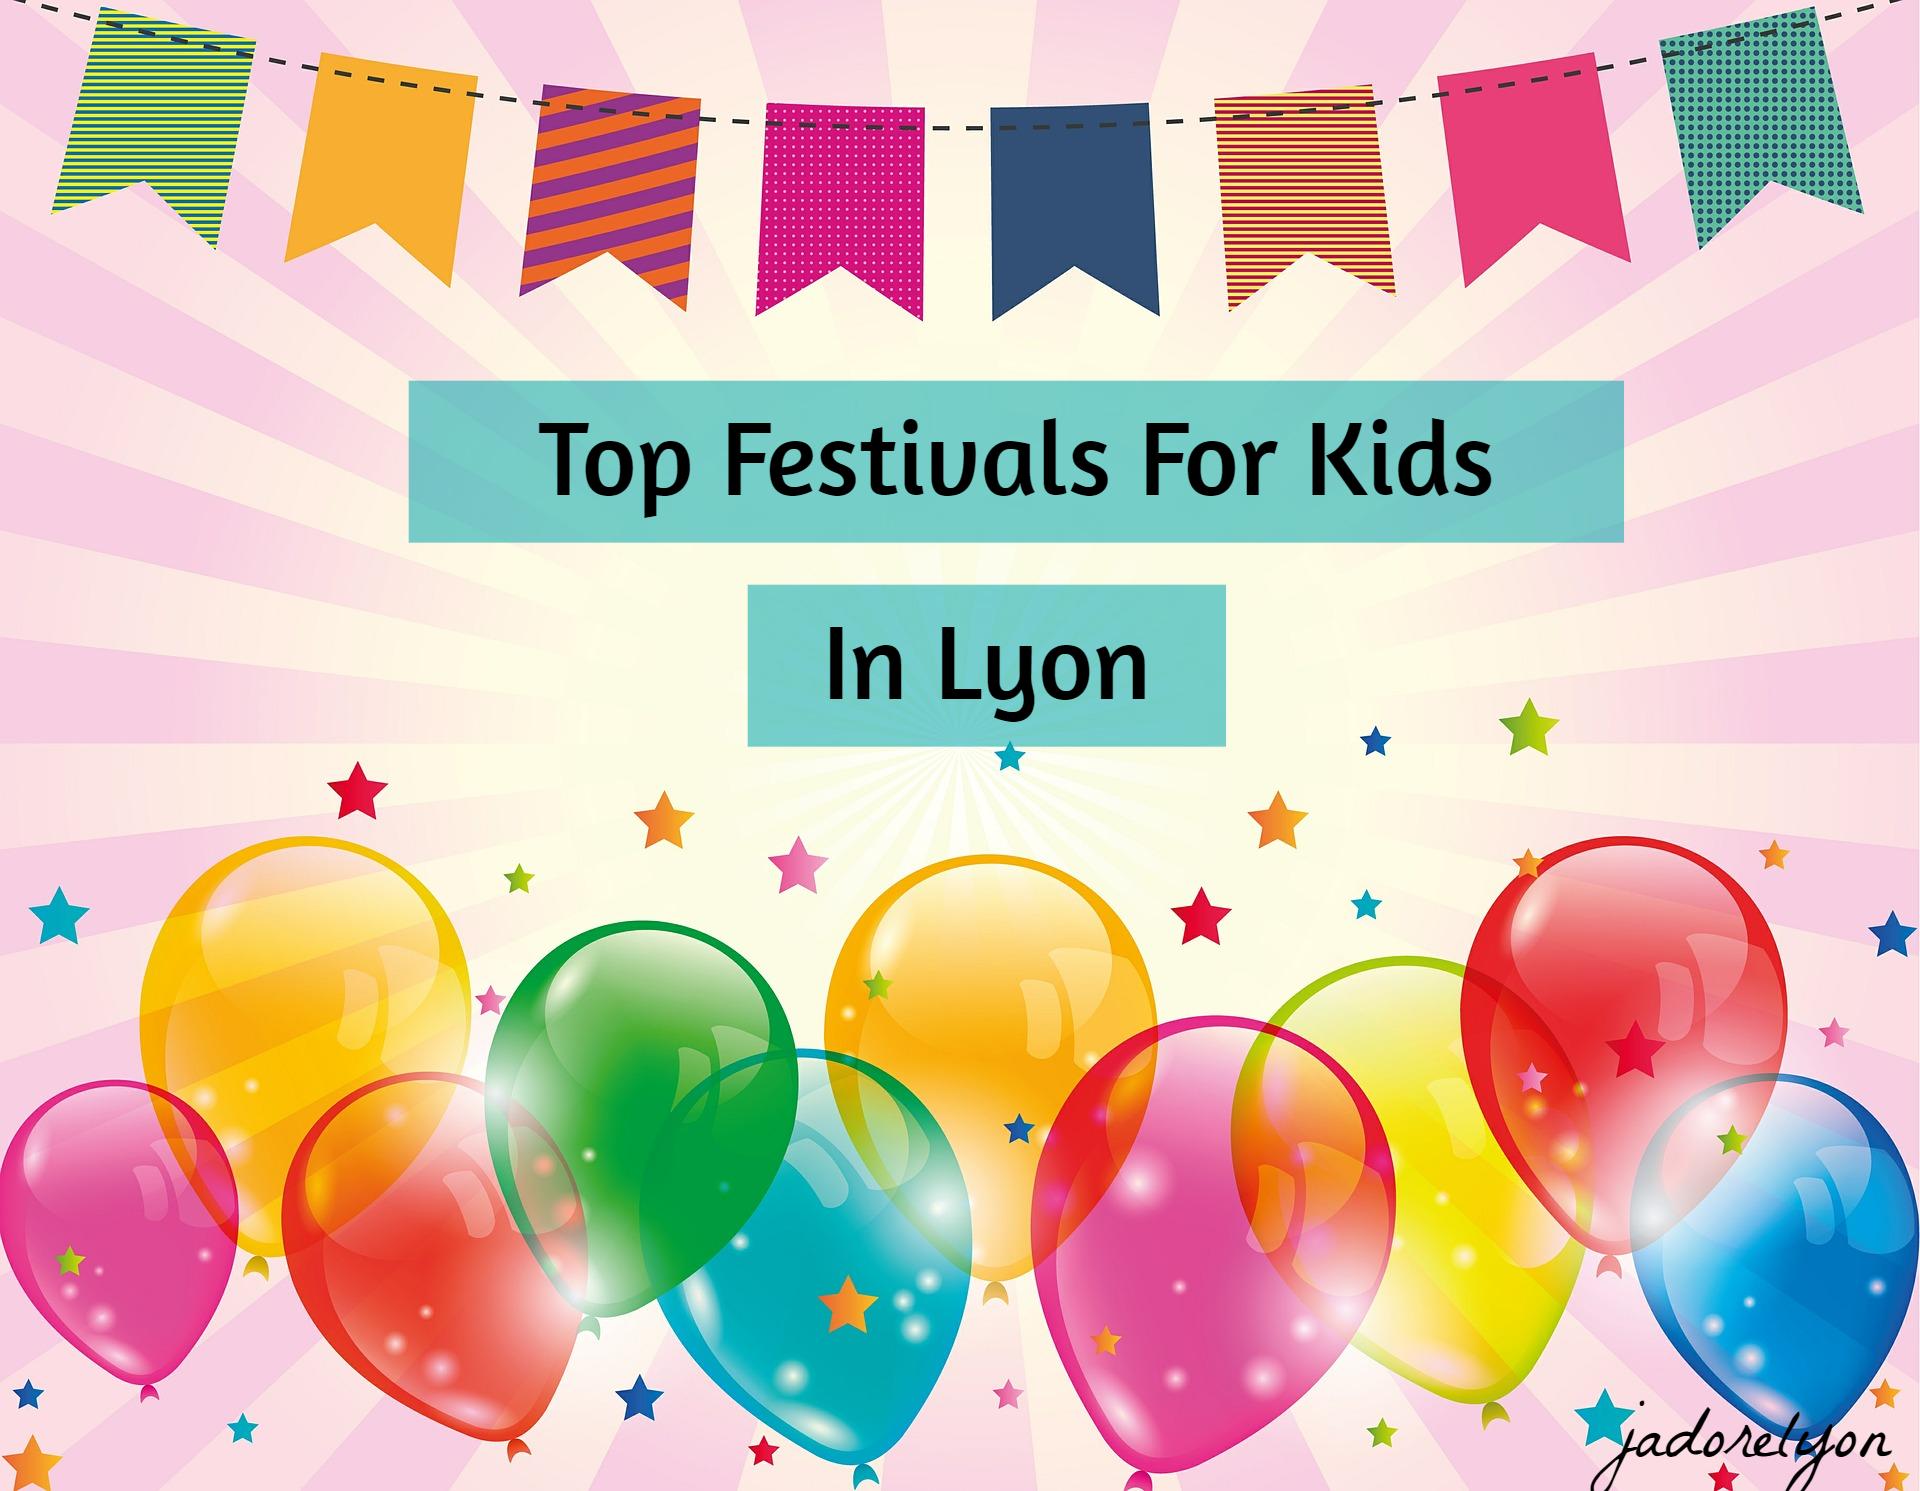 Top FEstivals For Kids in Lyon